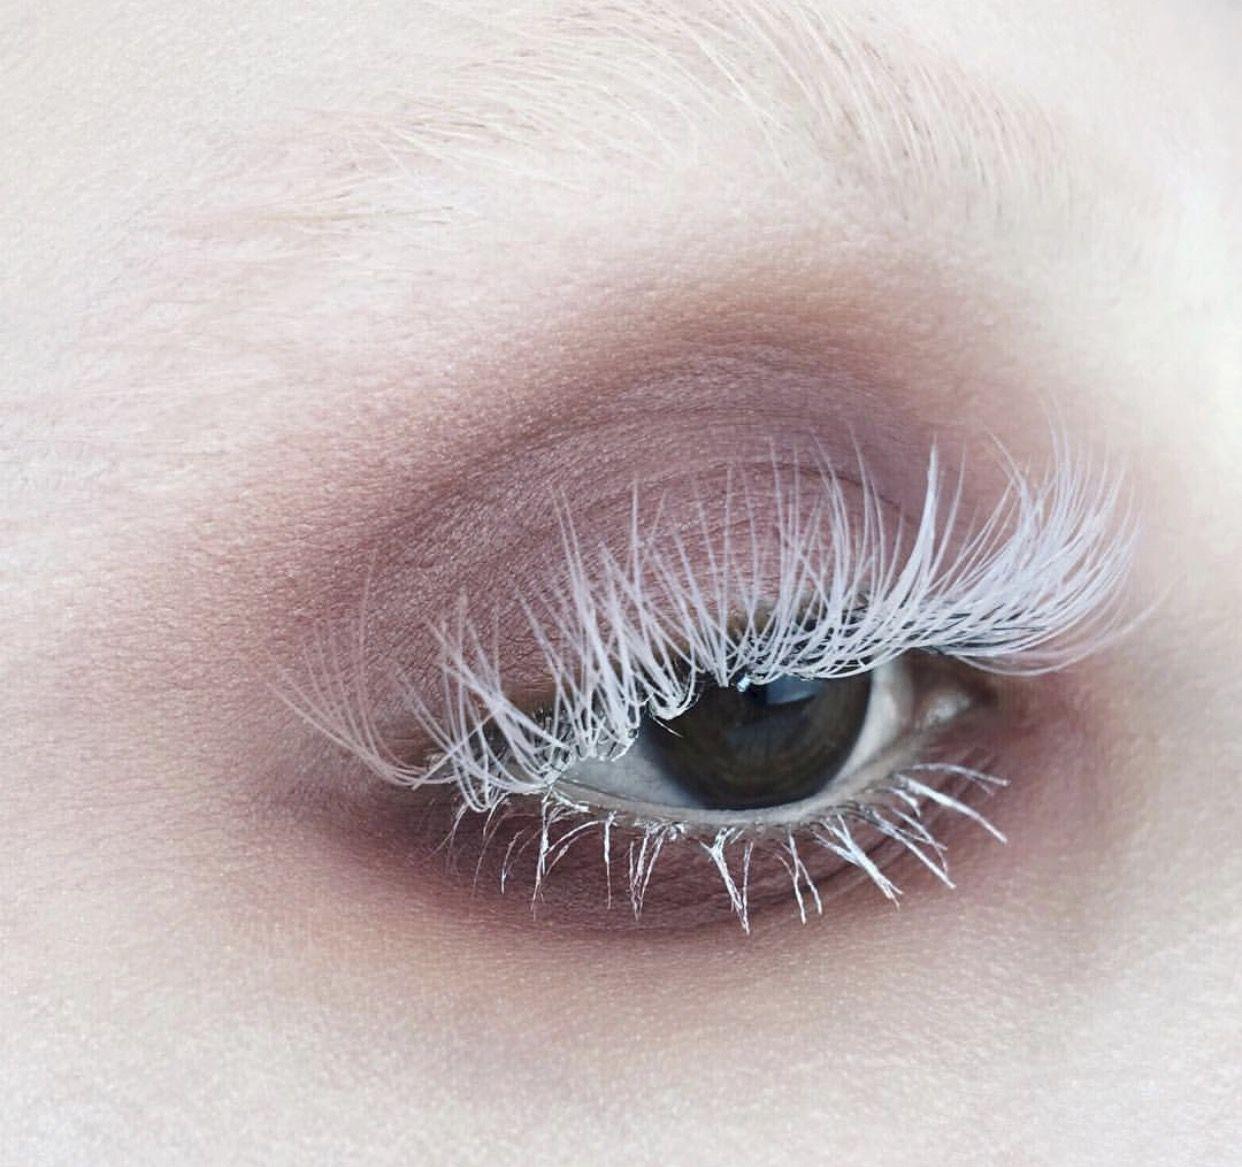 White lash extensions! \ufe0f | White eyelashes, Makeup art ...